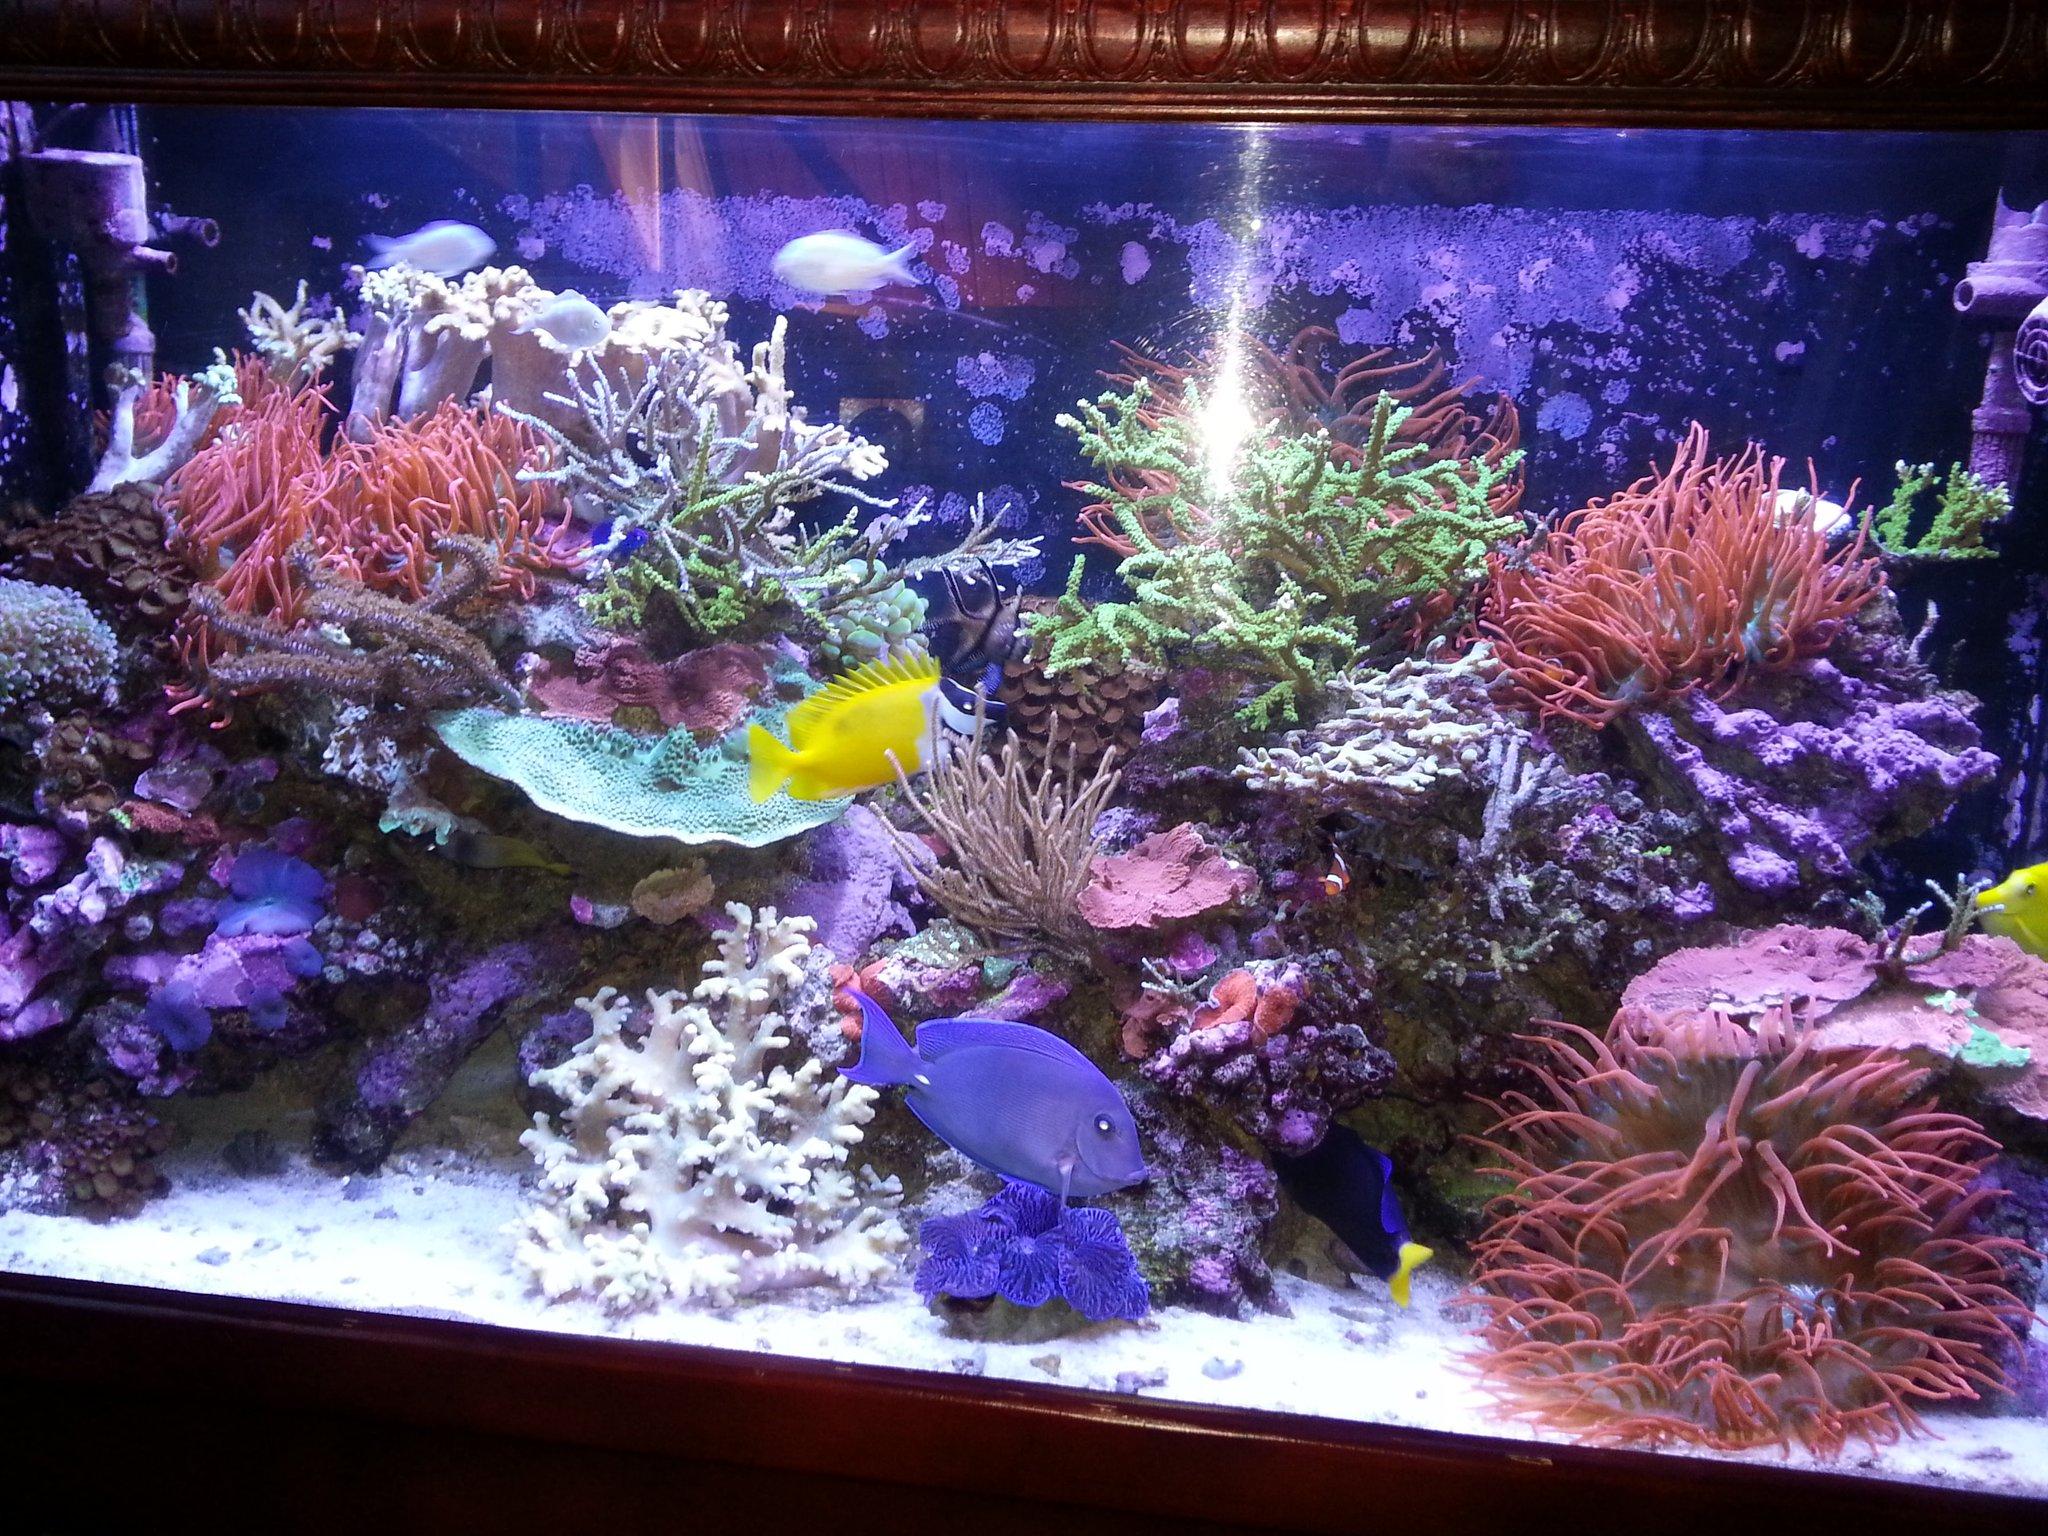 Hamilton Technology On Twitter This Reef Aquarium Uses